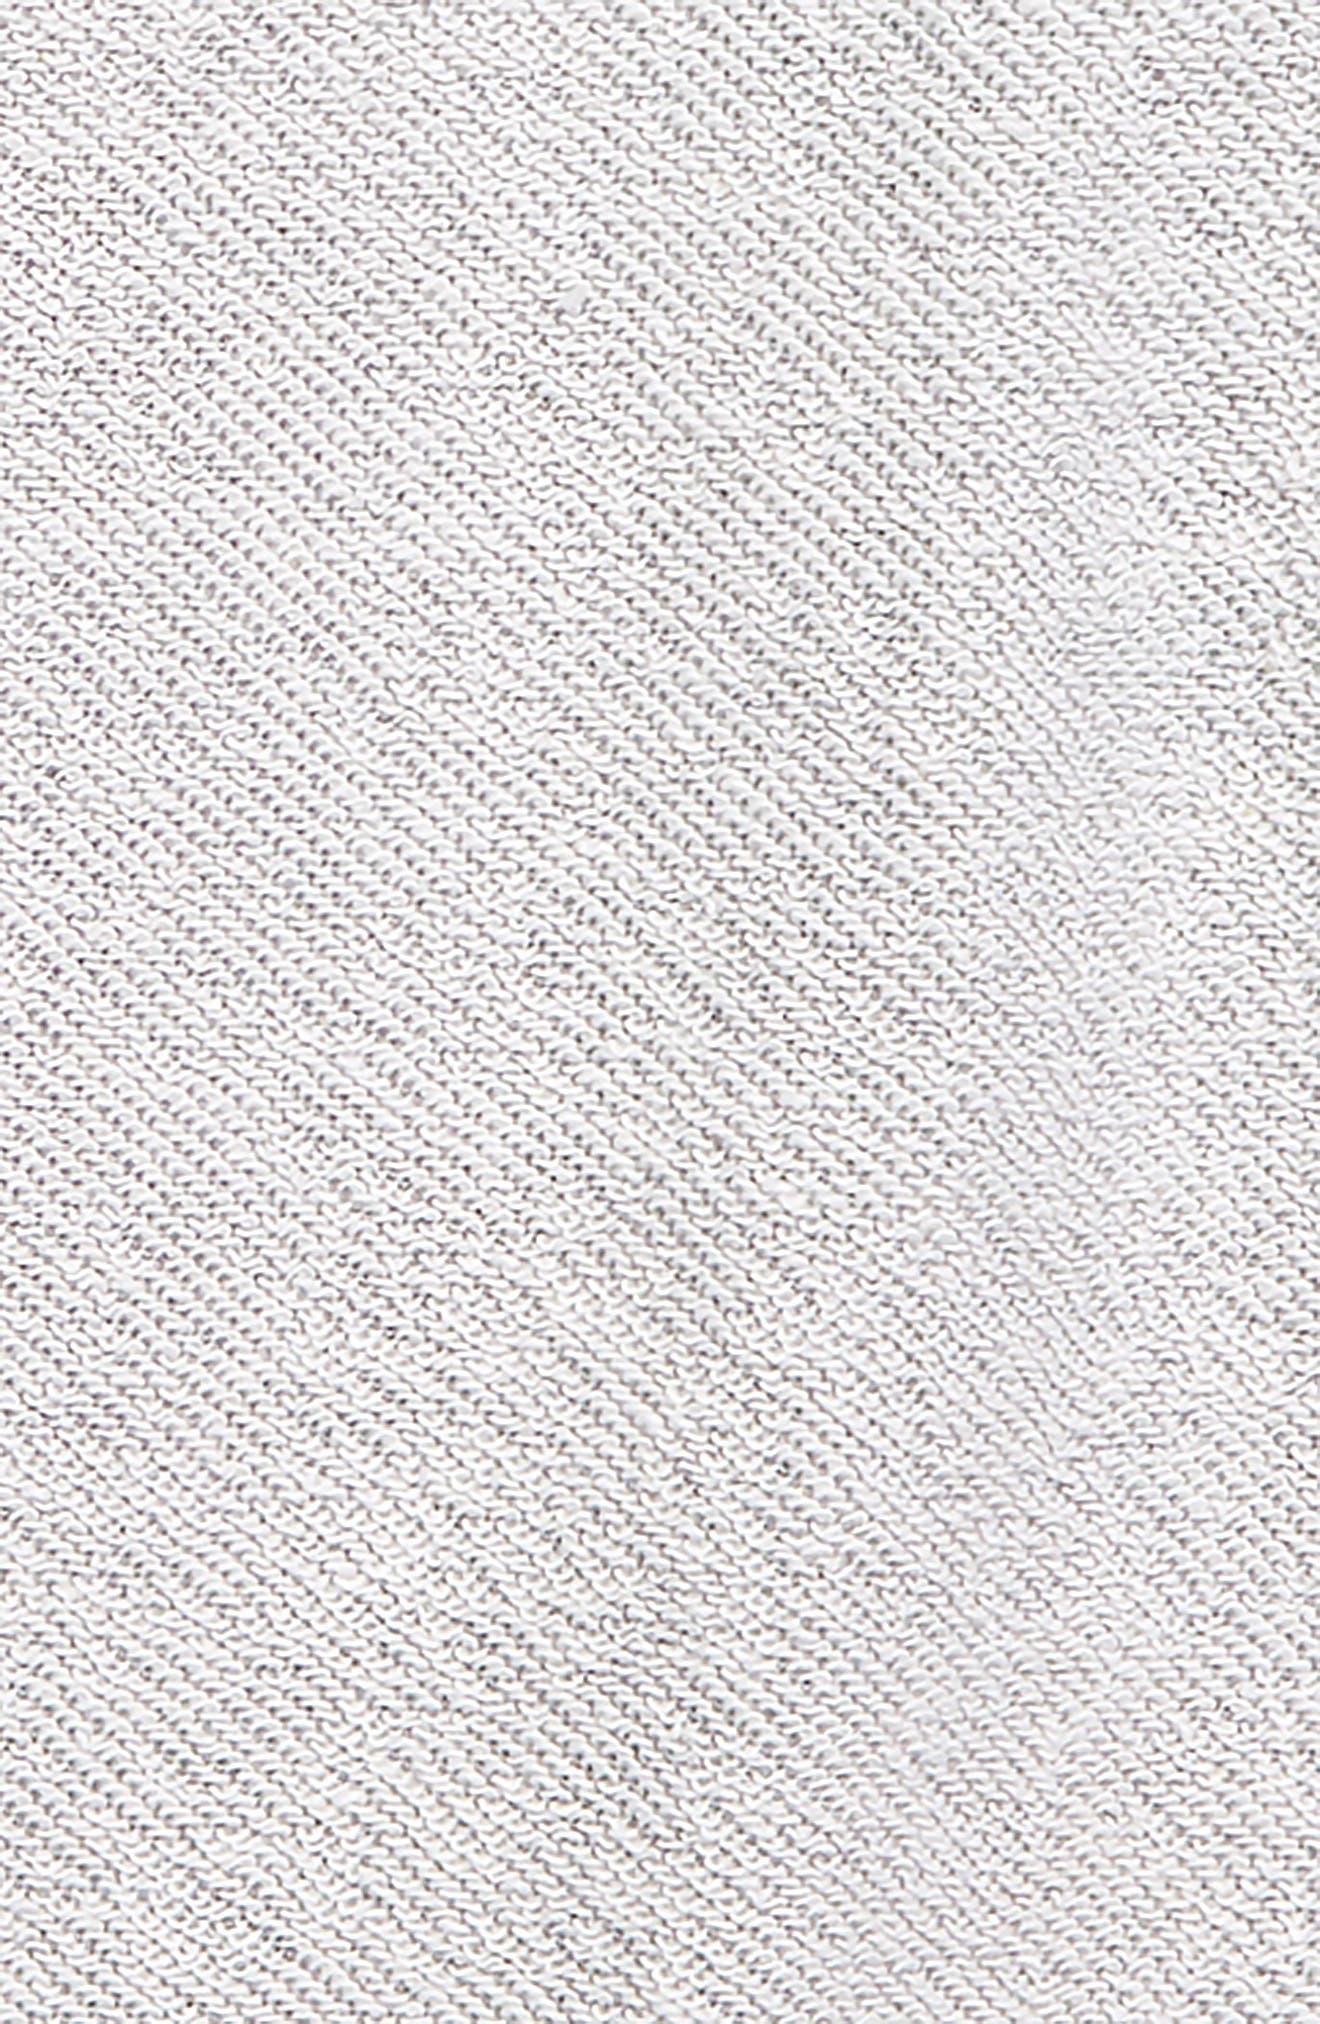 Elwood Splices Oversize Sweatshirt,                             Alternate thumbnail 2, color,                             HEATHER GREY